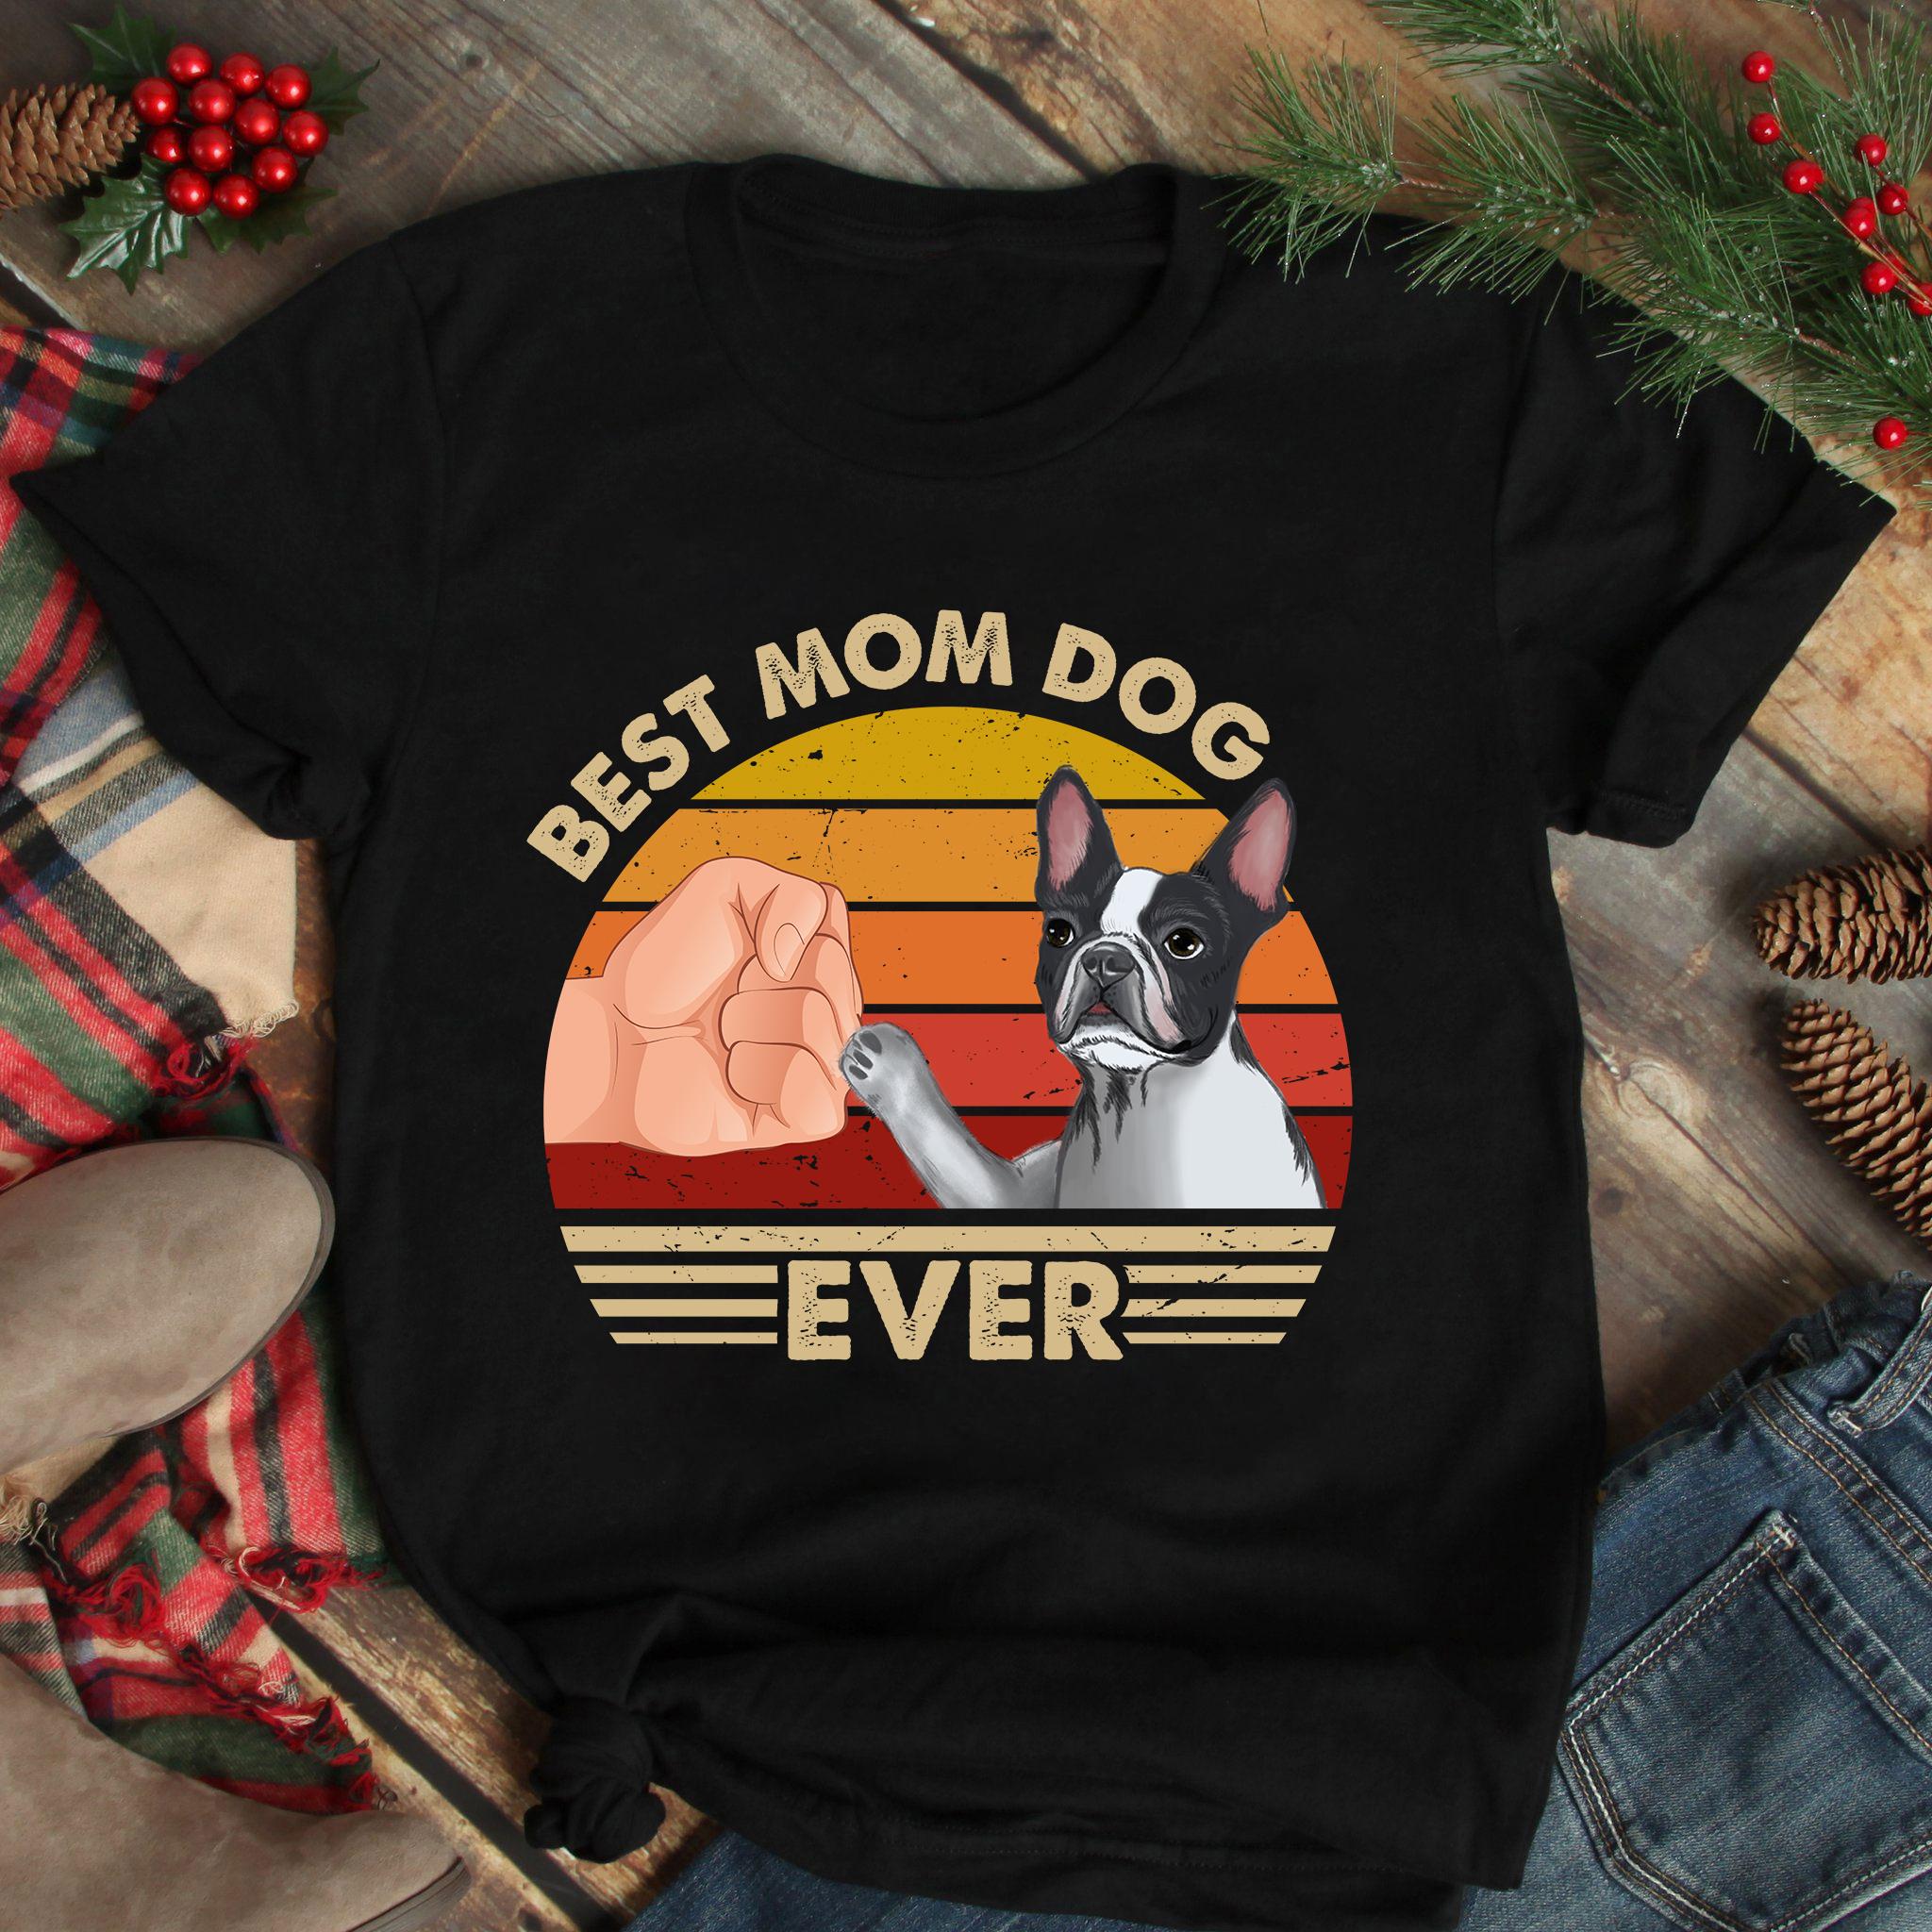 Best Mom Ever Shirt Vintage Best Boston Terrier Dog Mom Ever